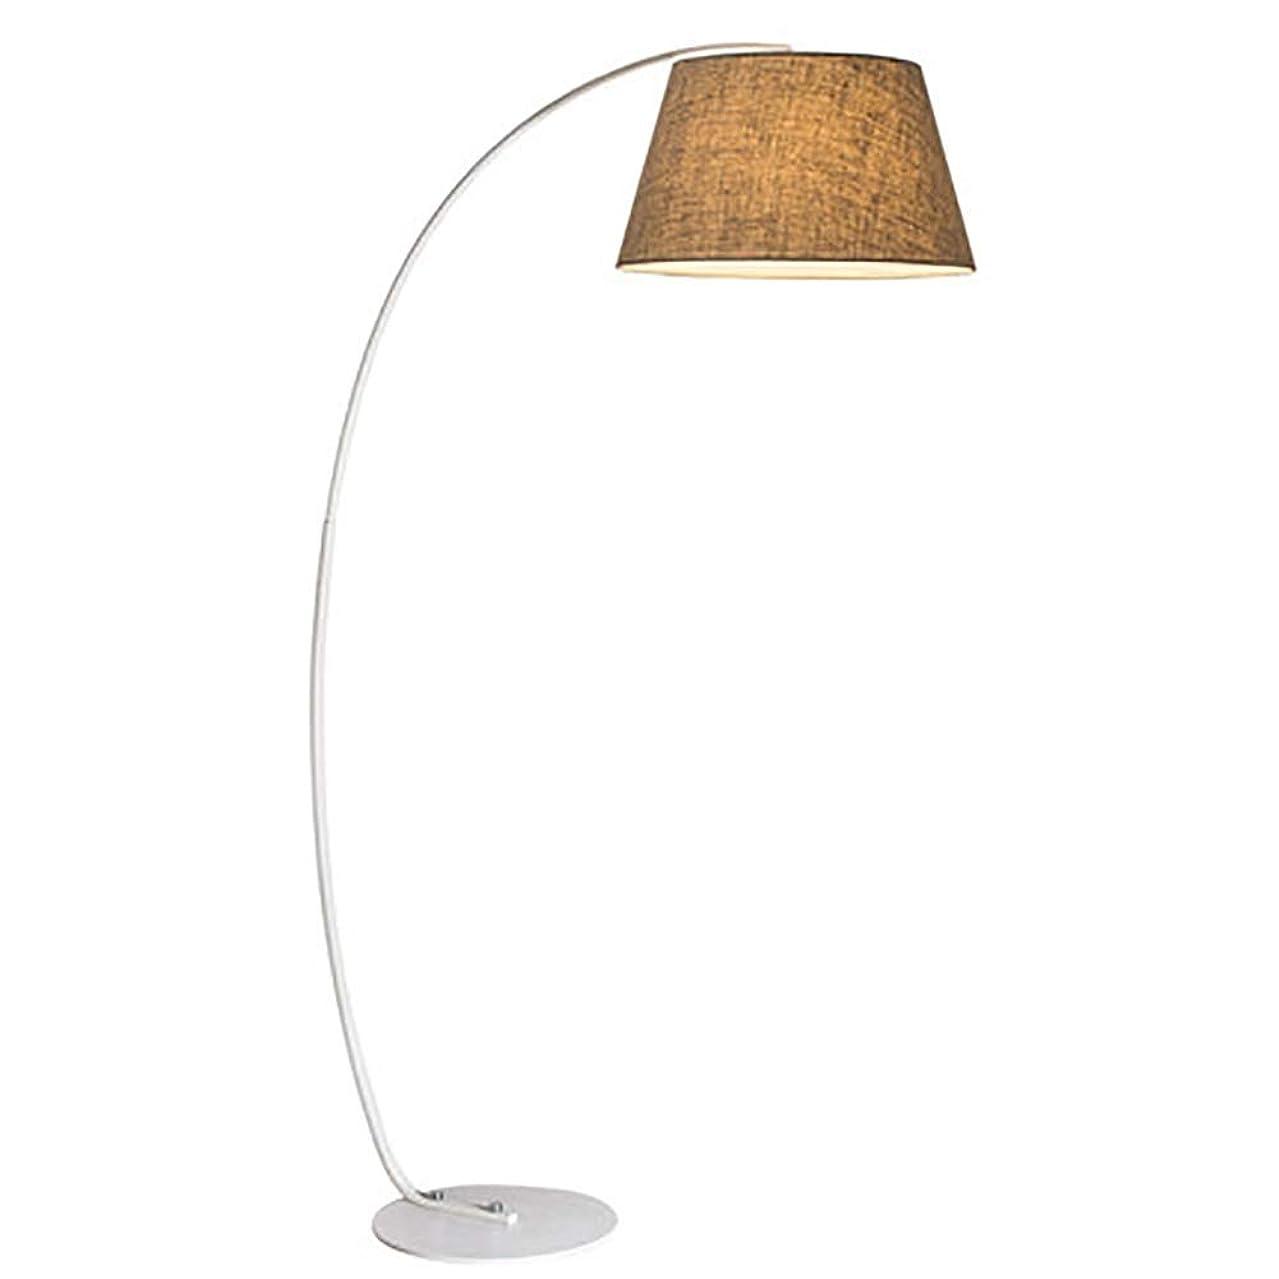 SGKJJ Floor Lamp- Fixture Uplight Lamp, Black/White Incandescent Lamp, Brushed Steel Lamp Oil Rubbed Bronze -185 Floor lamp (Color : B)